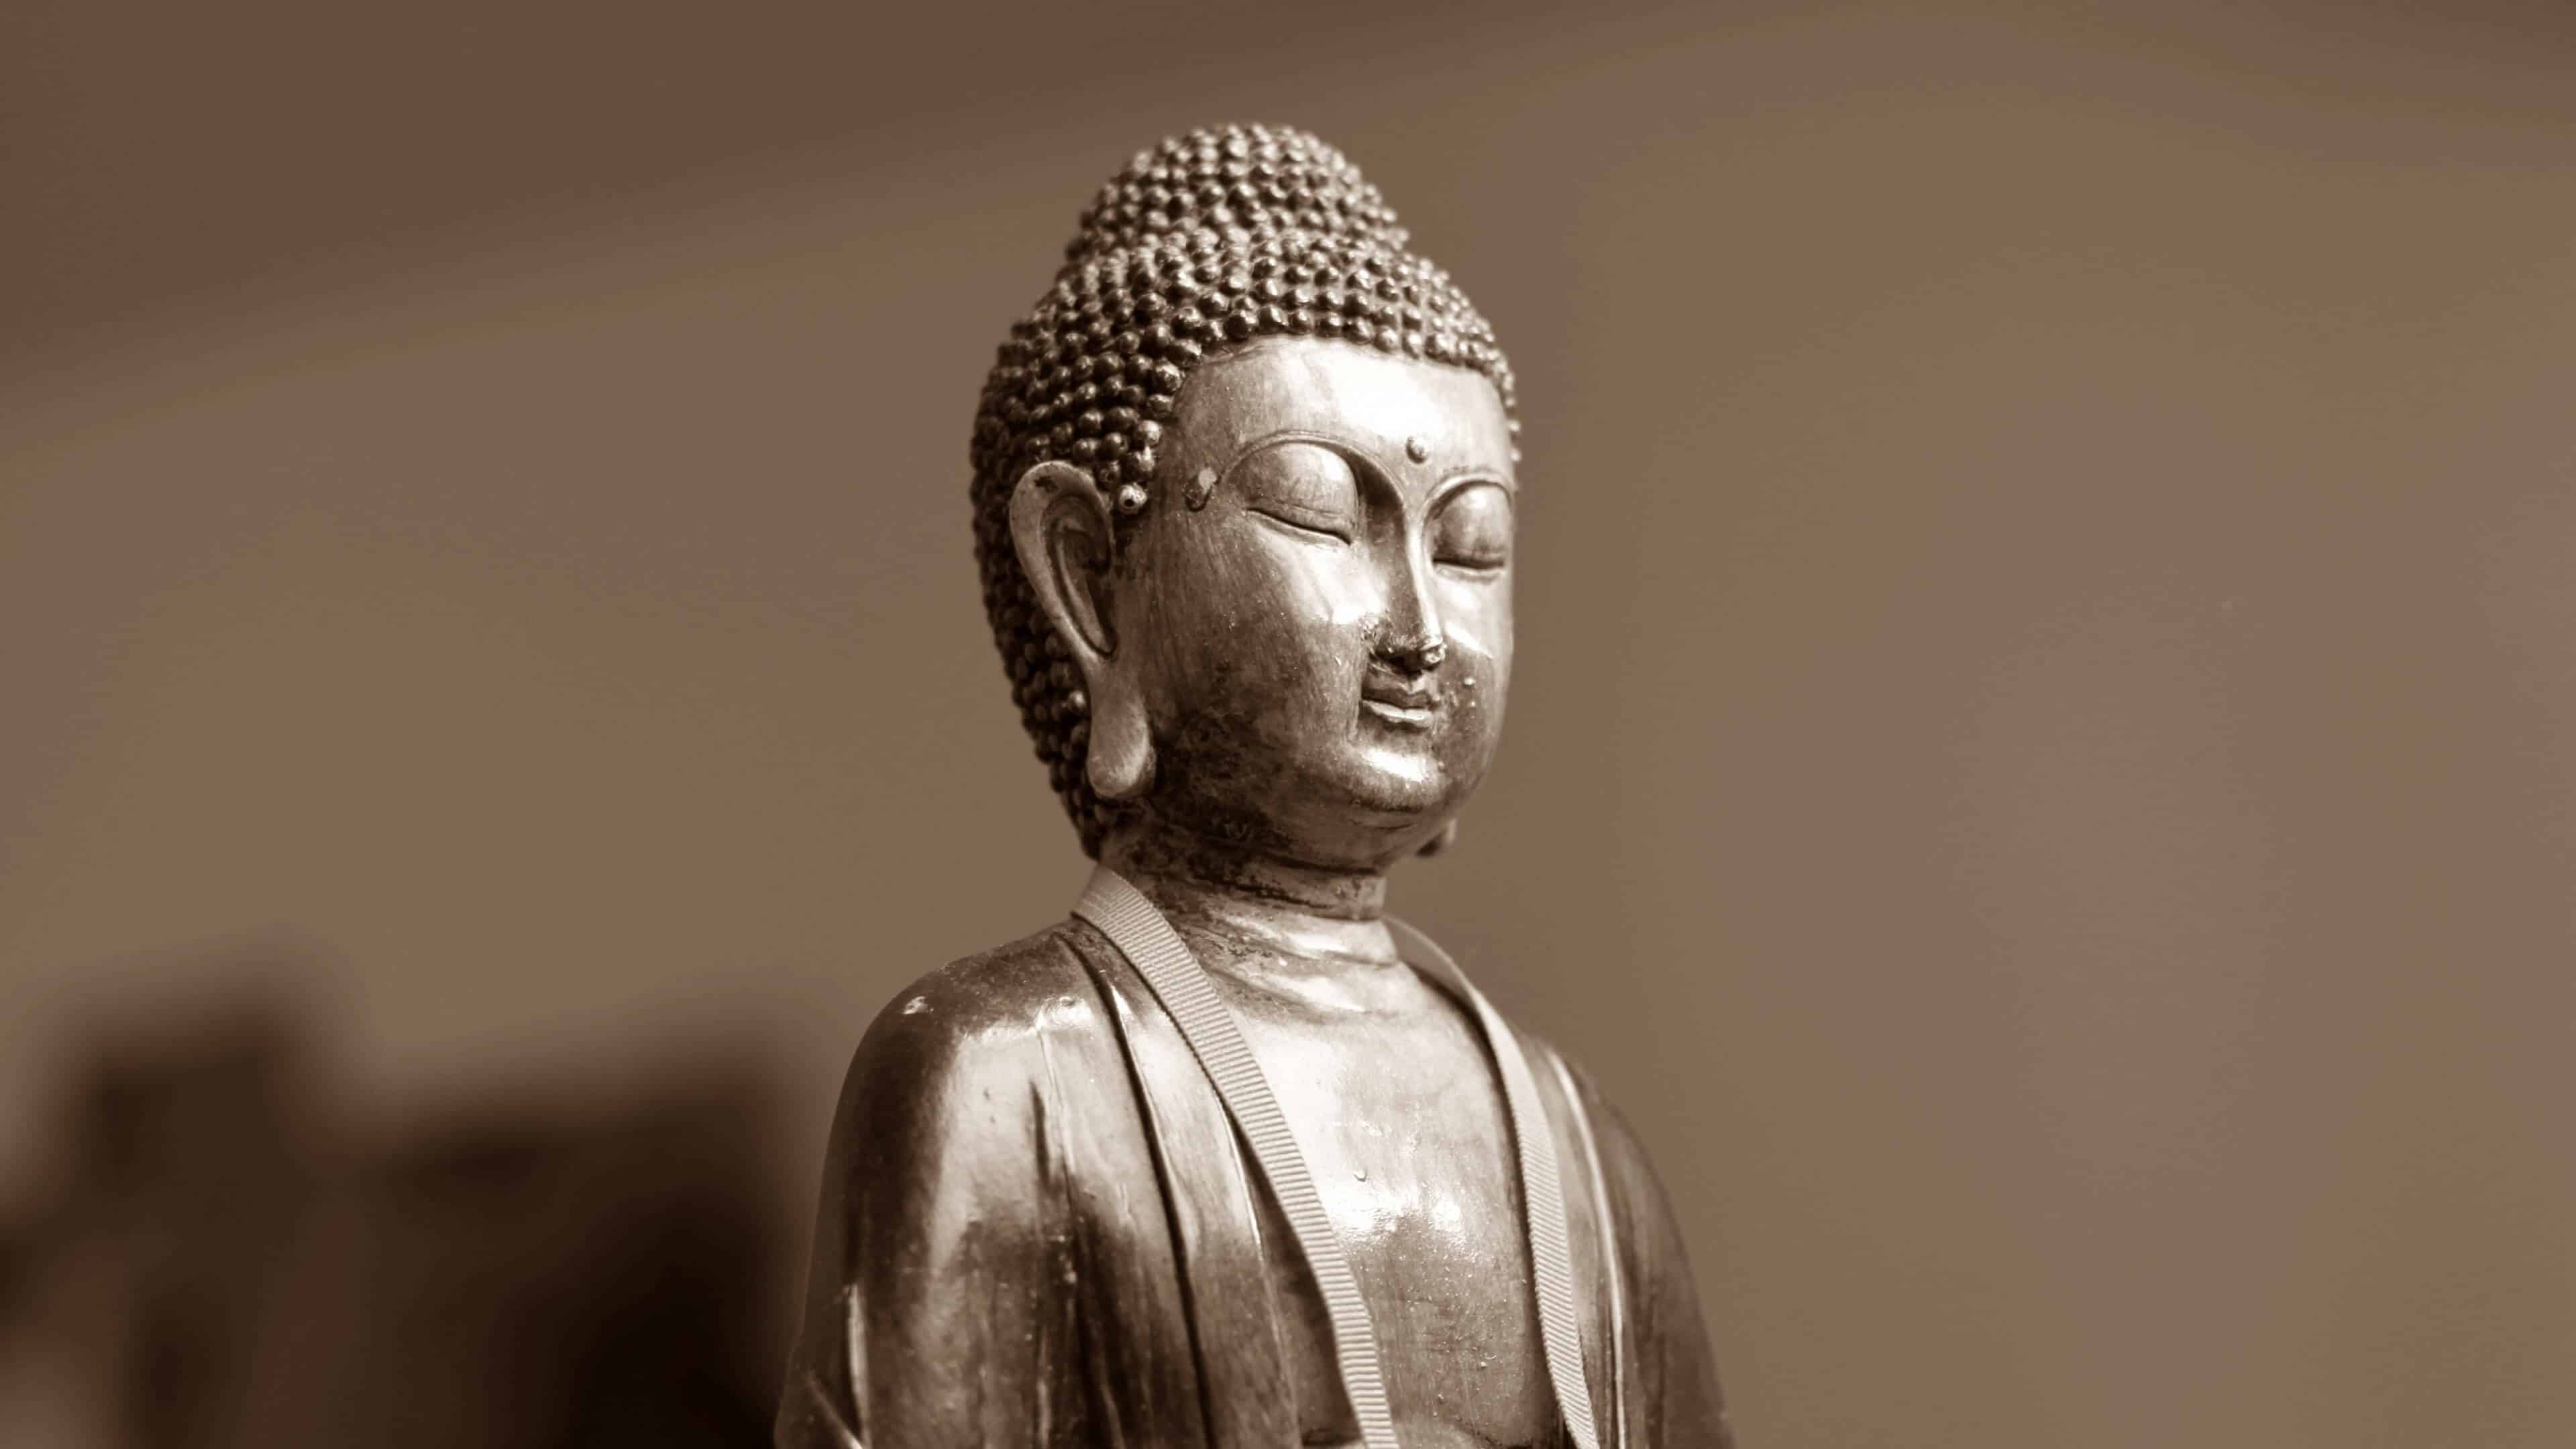 buddha statue uhd 4k wallpaper